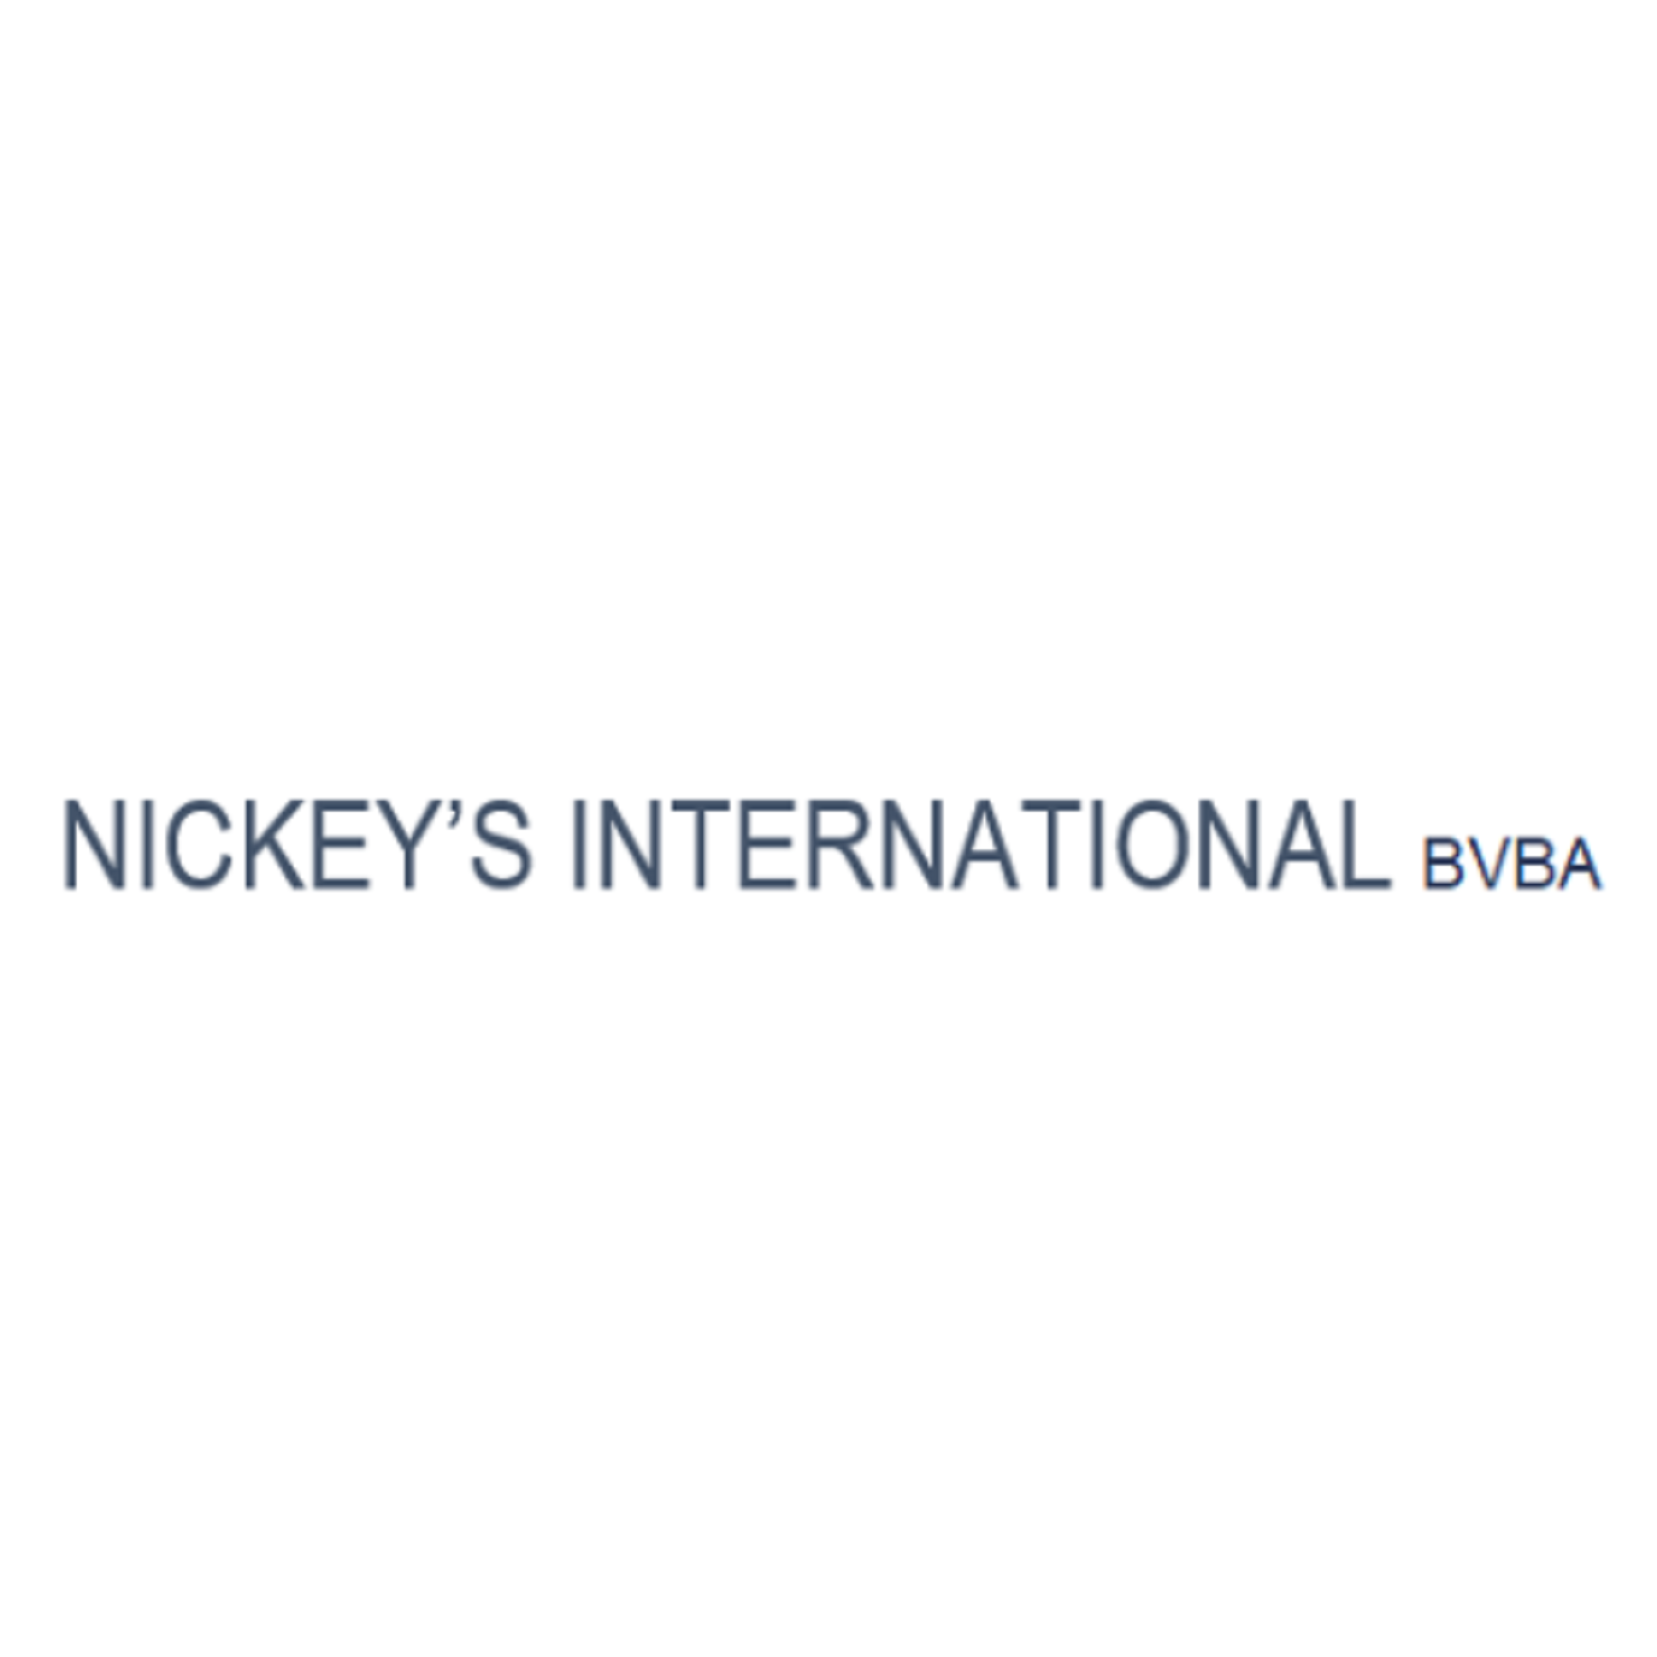 Nickey's International bvba